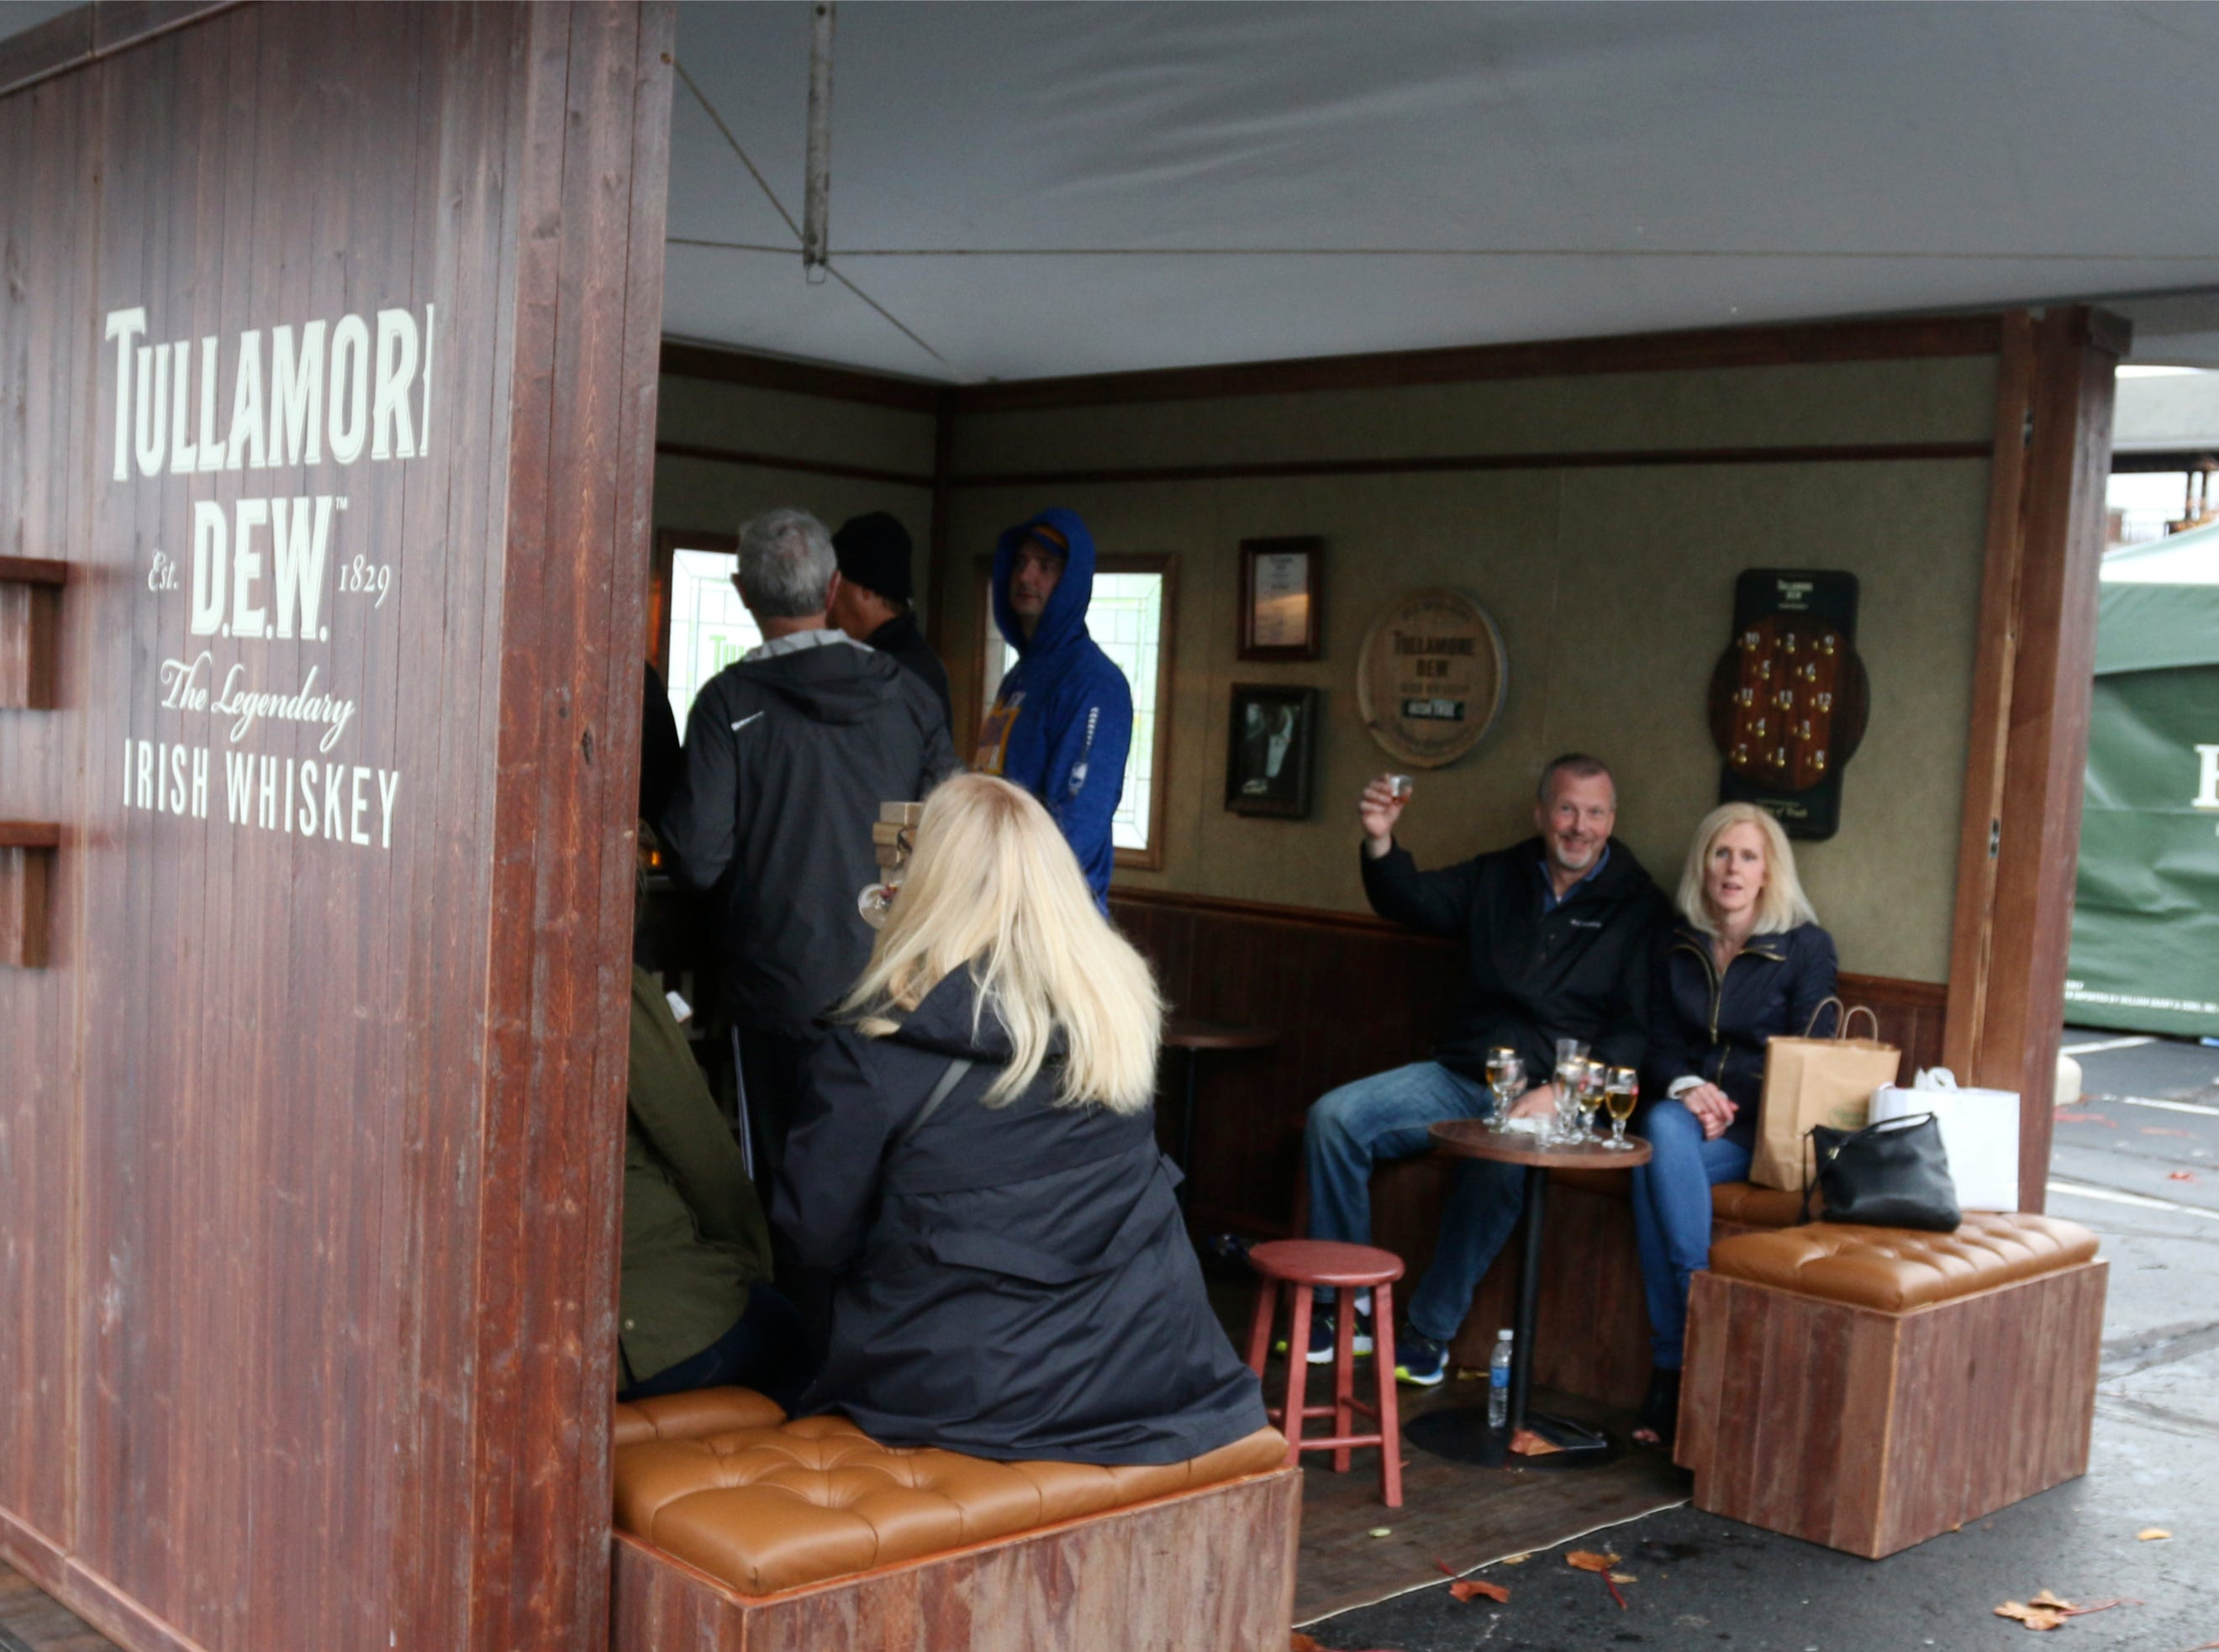 People enjoy specialty drink vendors at Kohler Food and Wine, Friday, October 19, 2018, in Kohler, Wis.